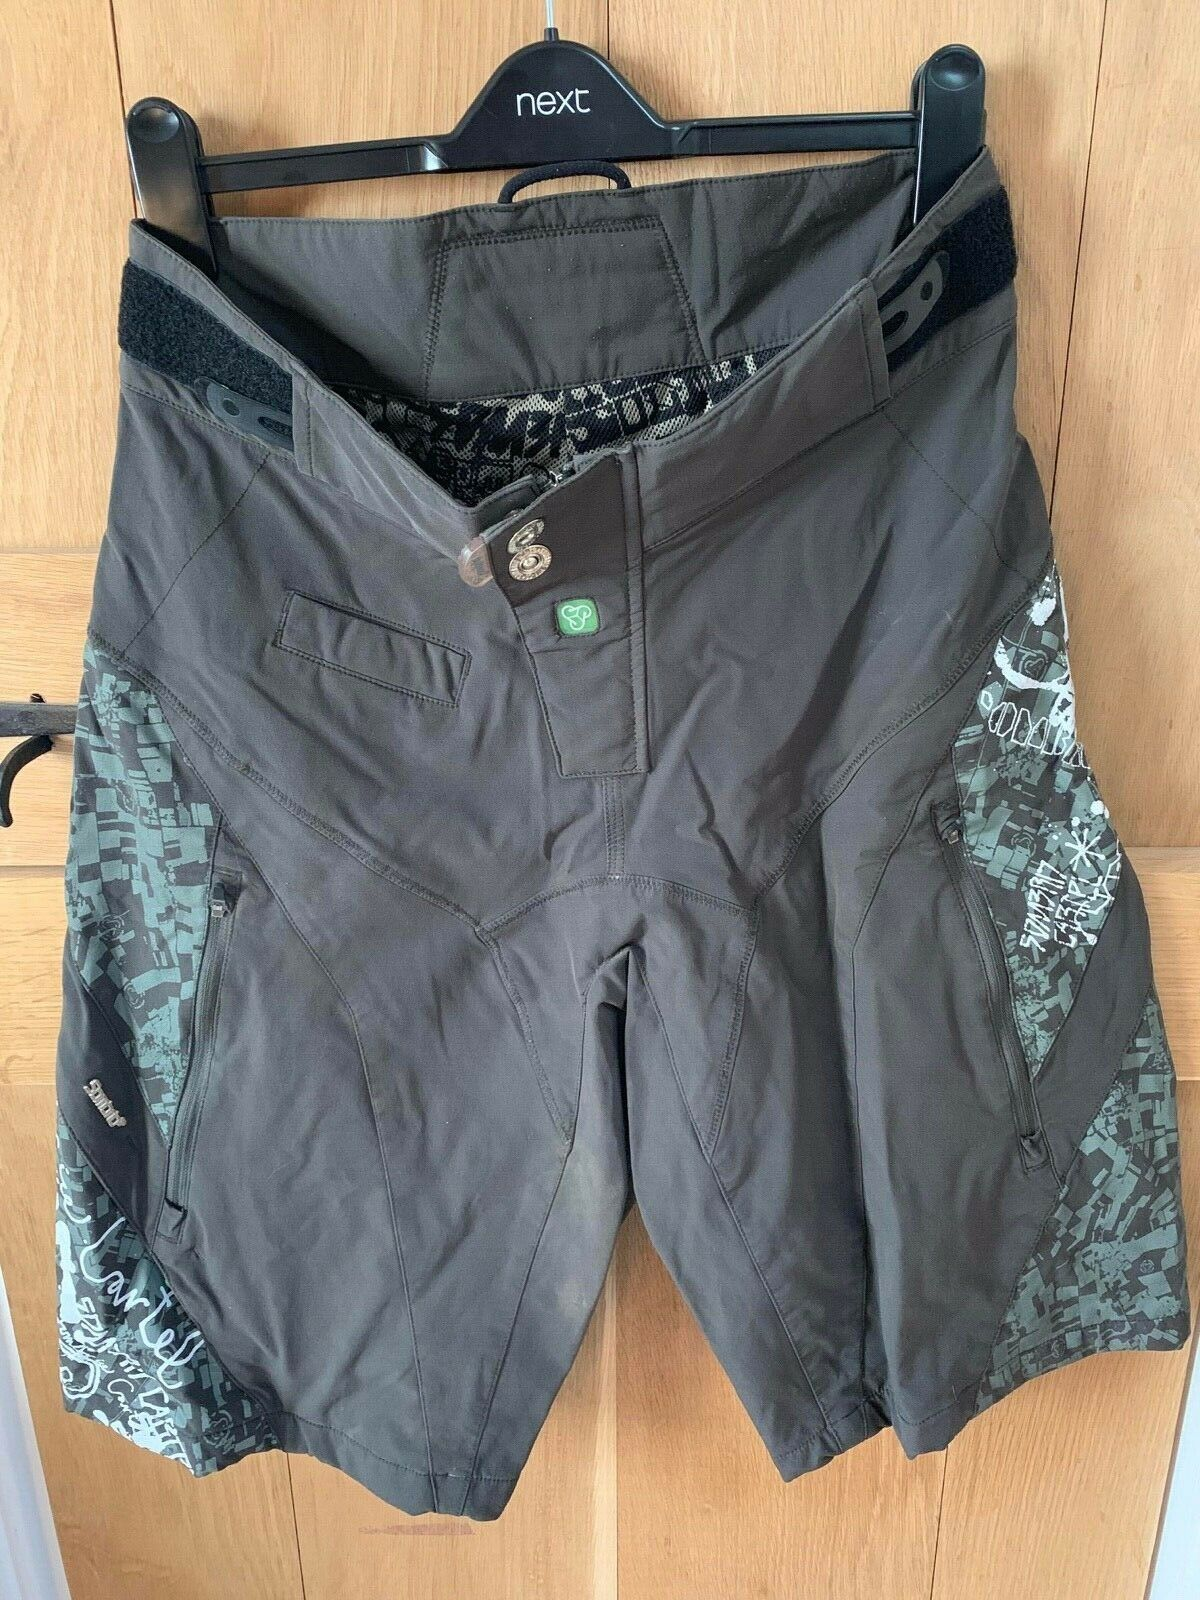 Sombrio Rev Moto MTB Shorts - M -  Olive  floor price